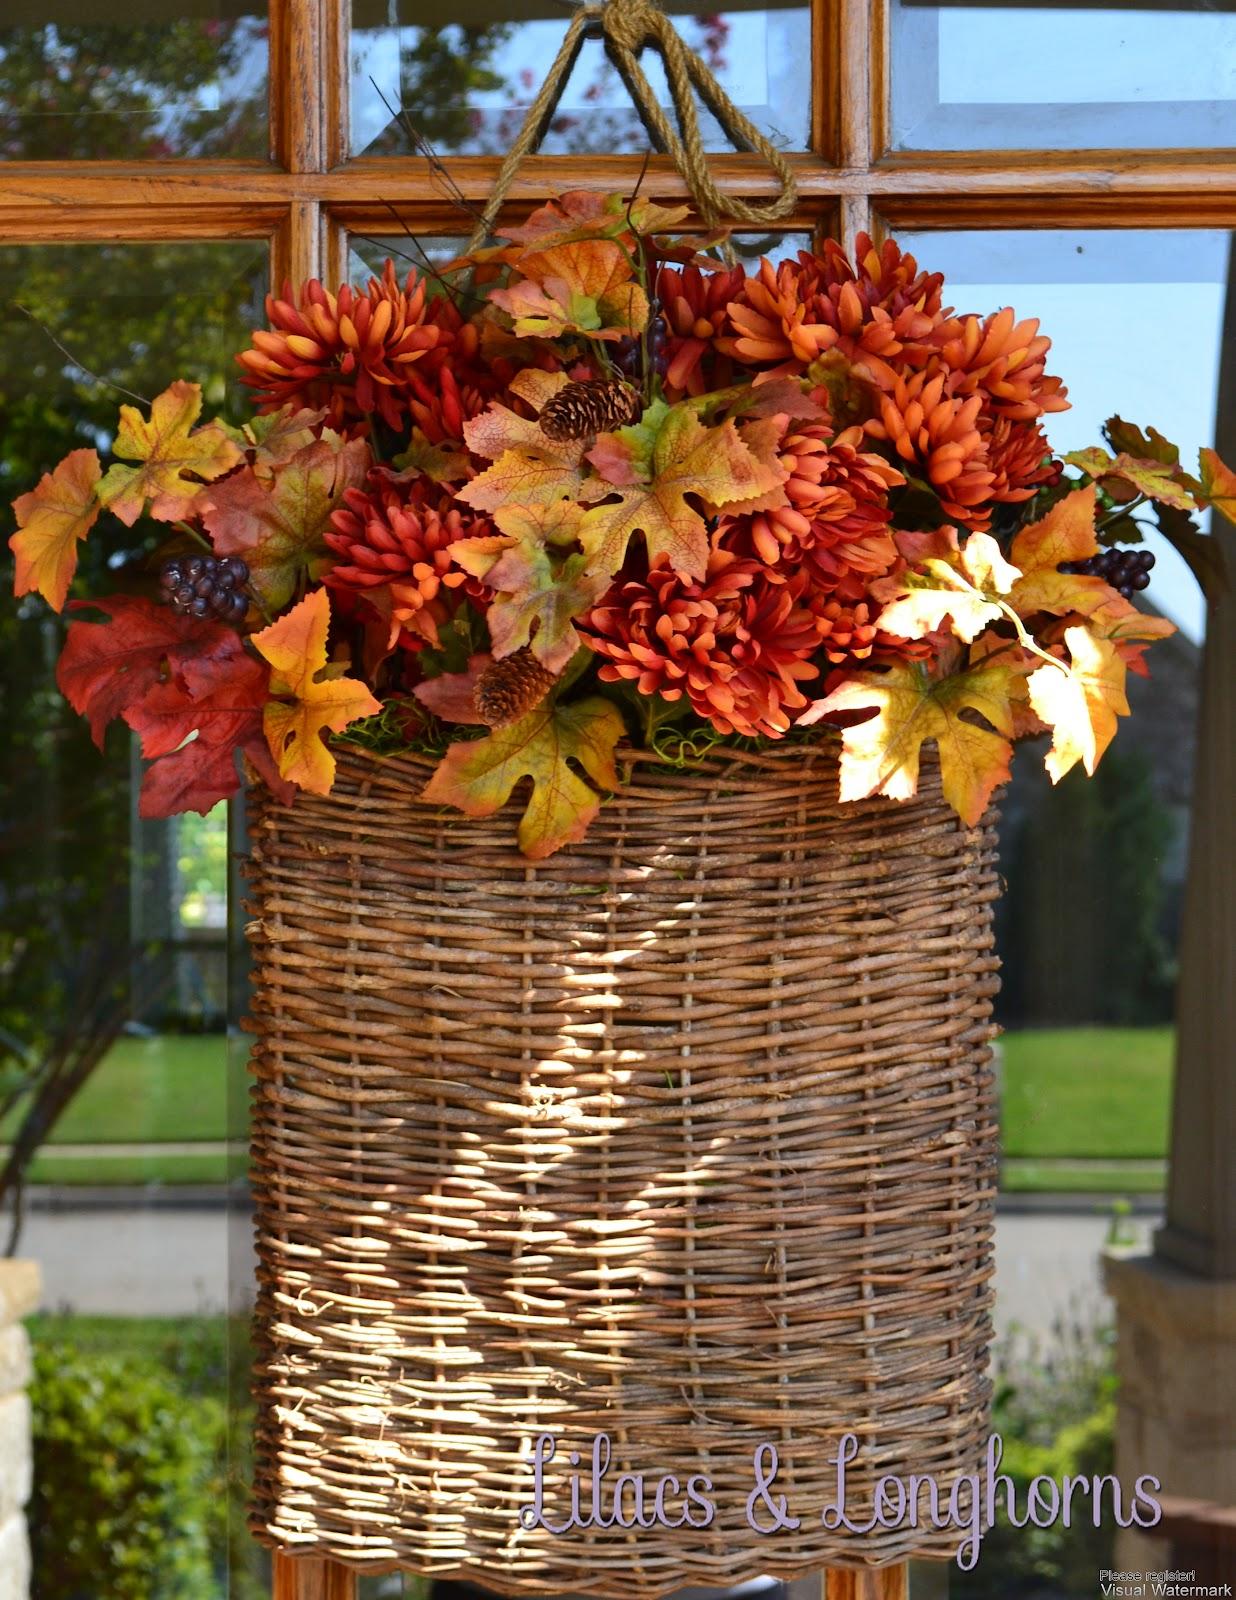 Fall Decorating Outdoors Lilacs And Longhornslilacs And Longhorns